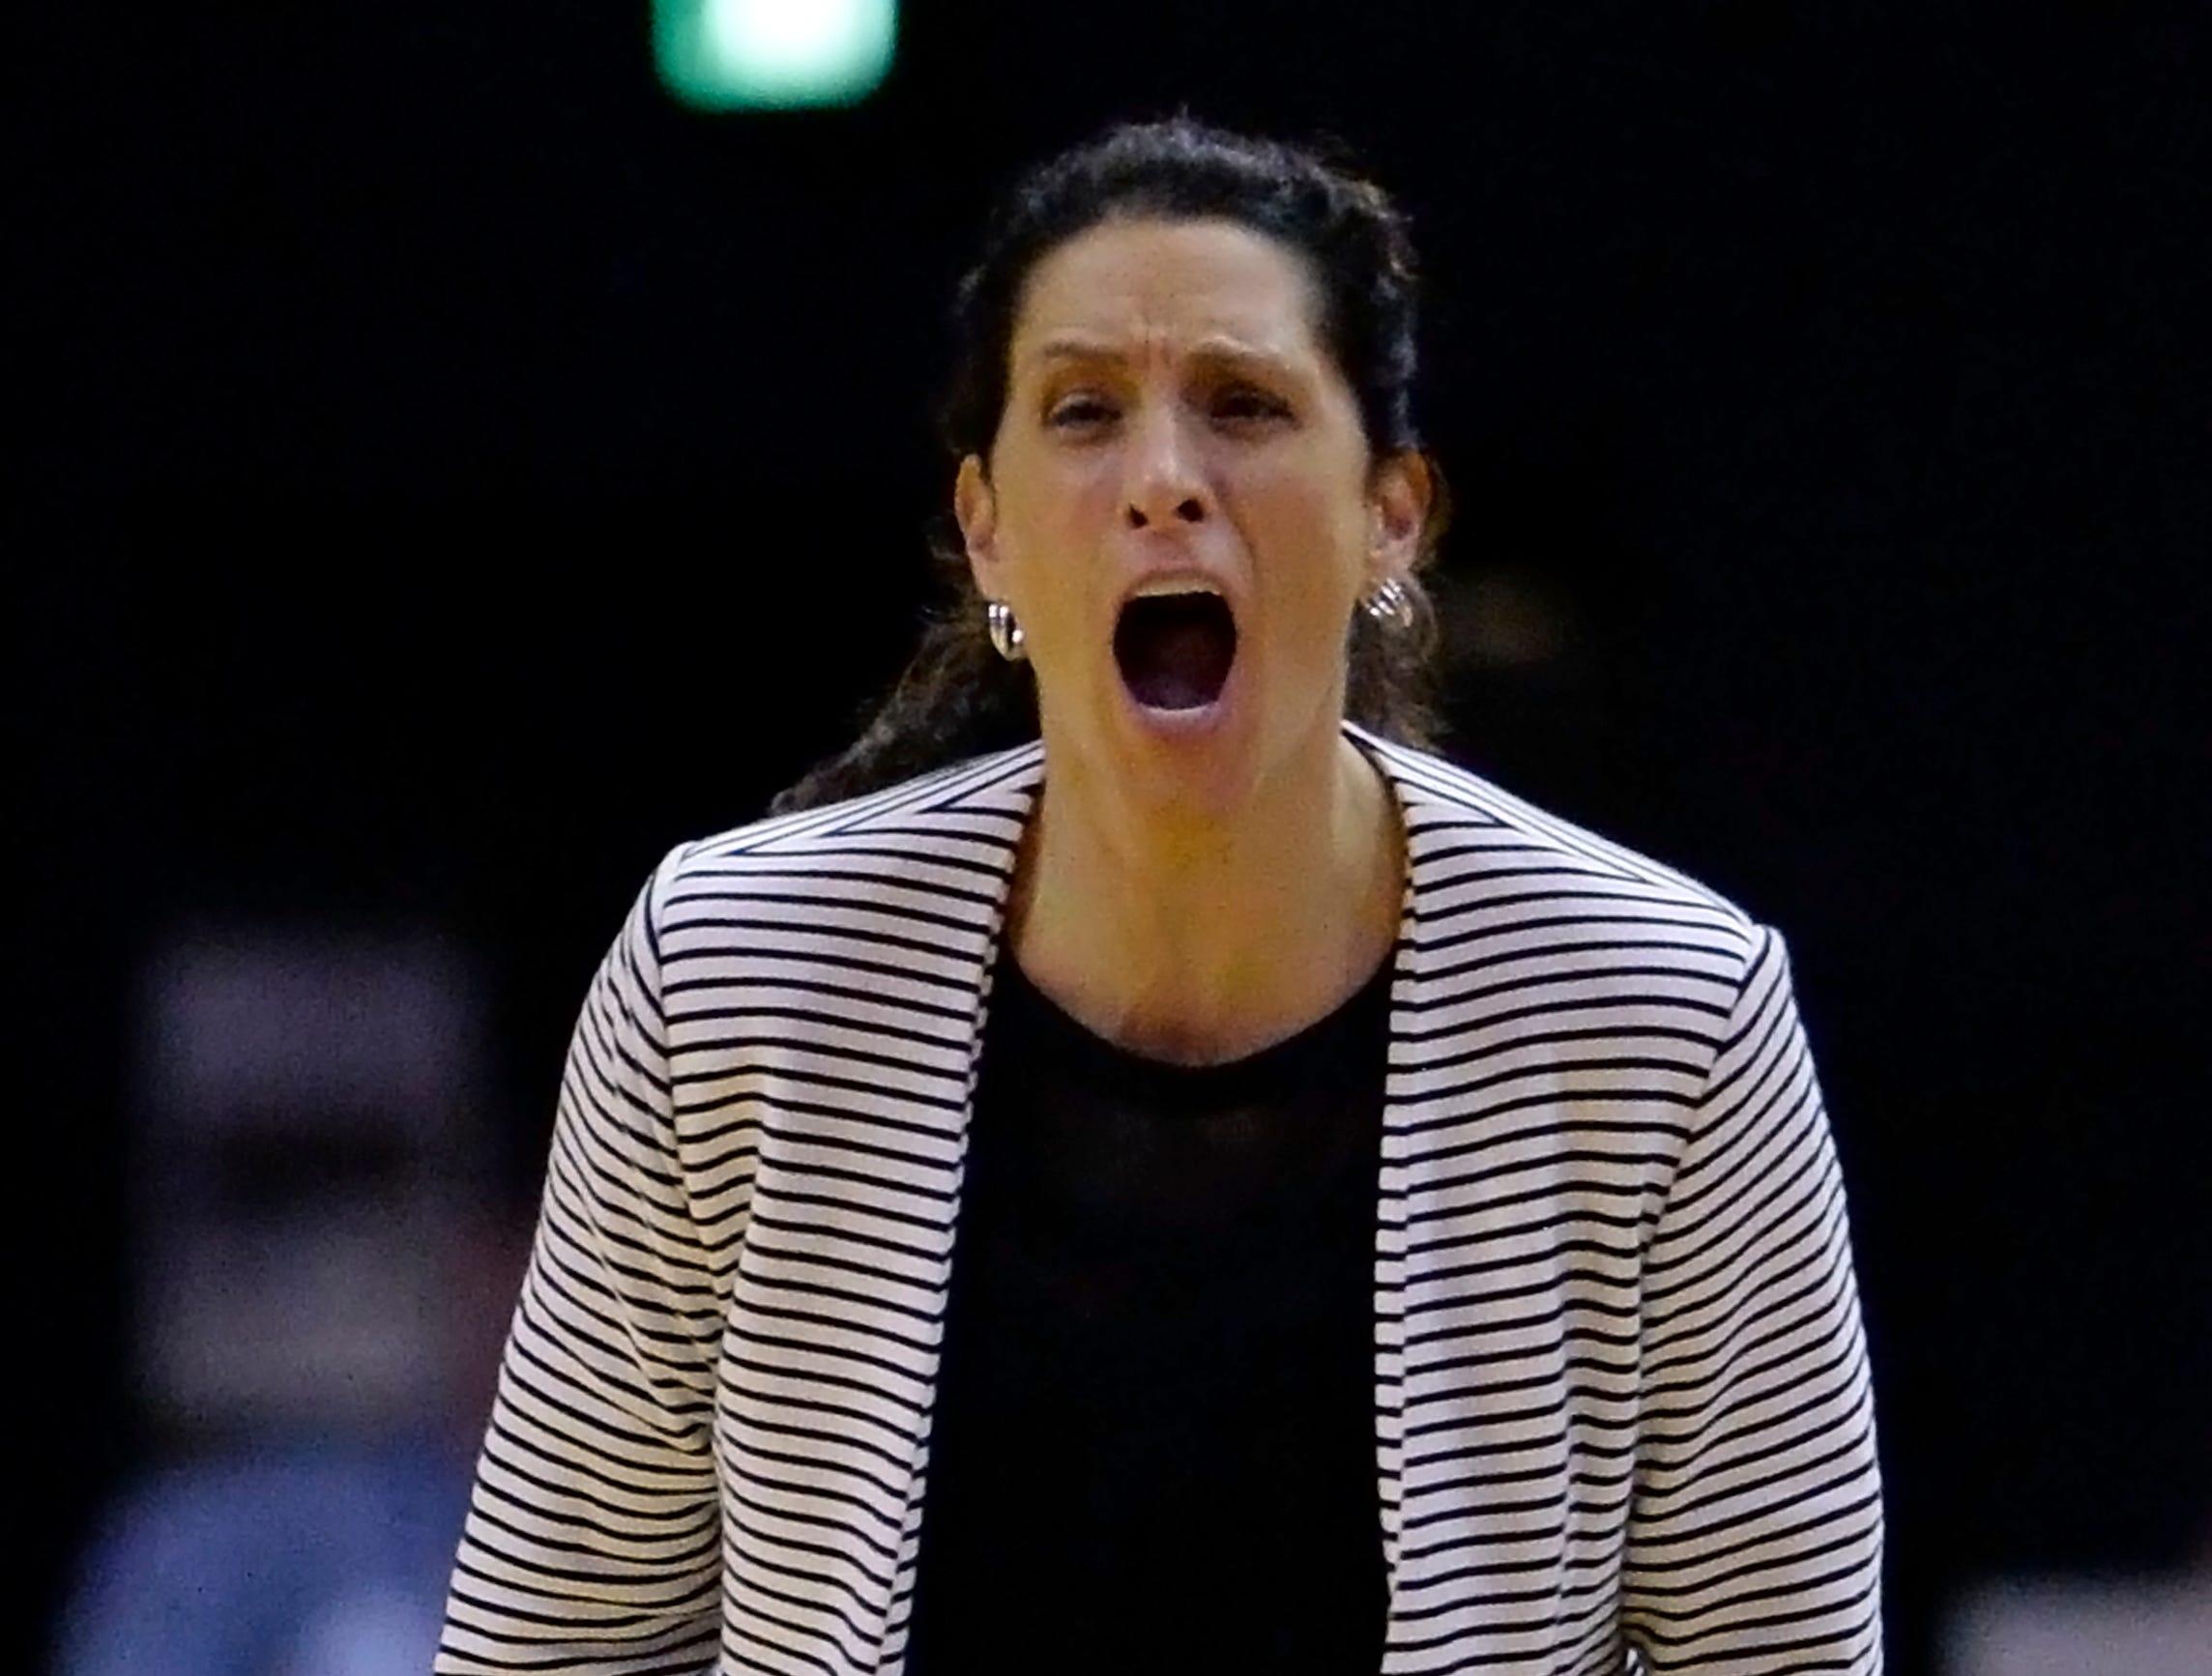 Vanderbilt head coach Stephanie White yells to her players during the second half of an NCAA college basketball game against Austin Peay Monday, Nov. 12, 2018, in Nashville, Tenn. Vanderbilt won 99-70.